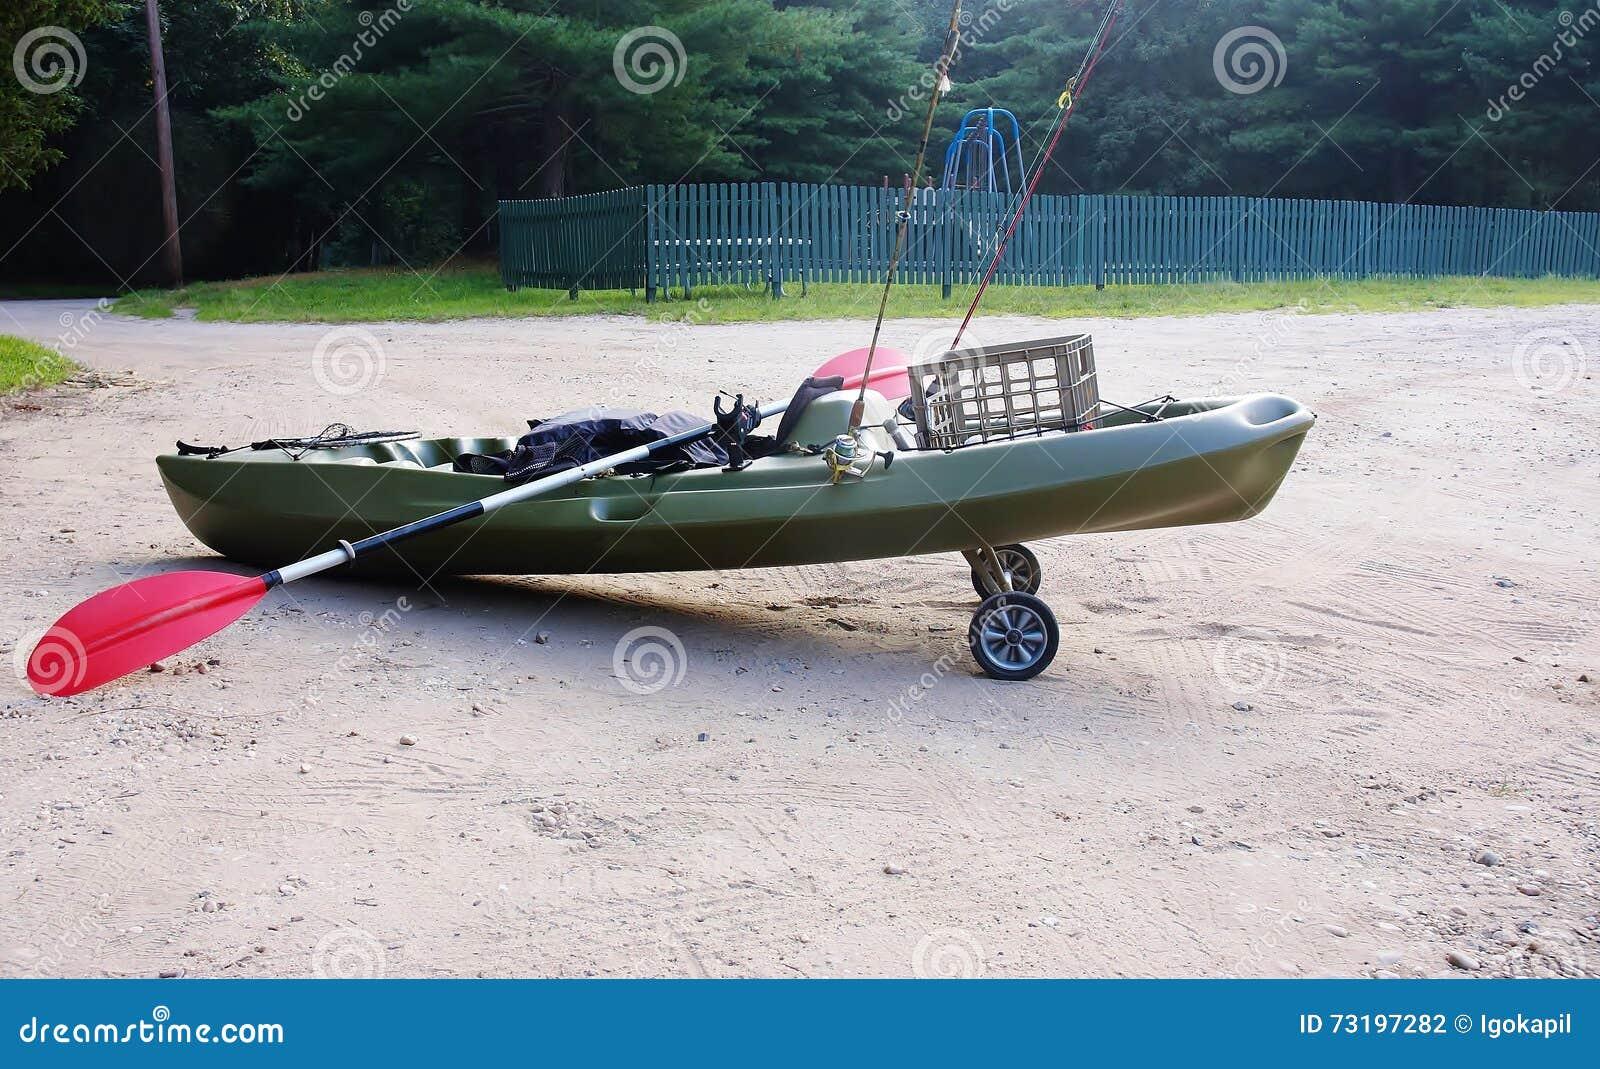 Fishing kayak on wheels paddle rods